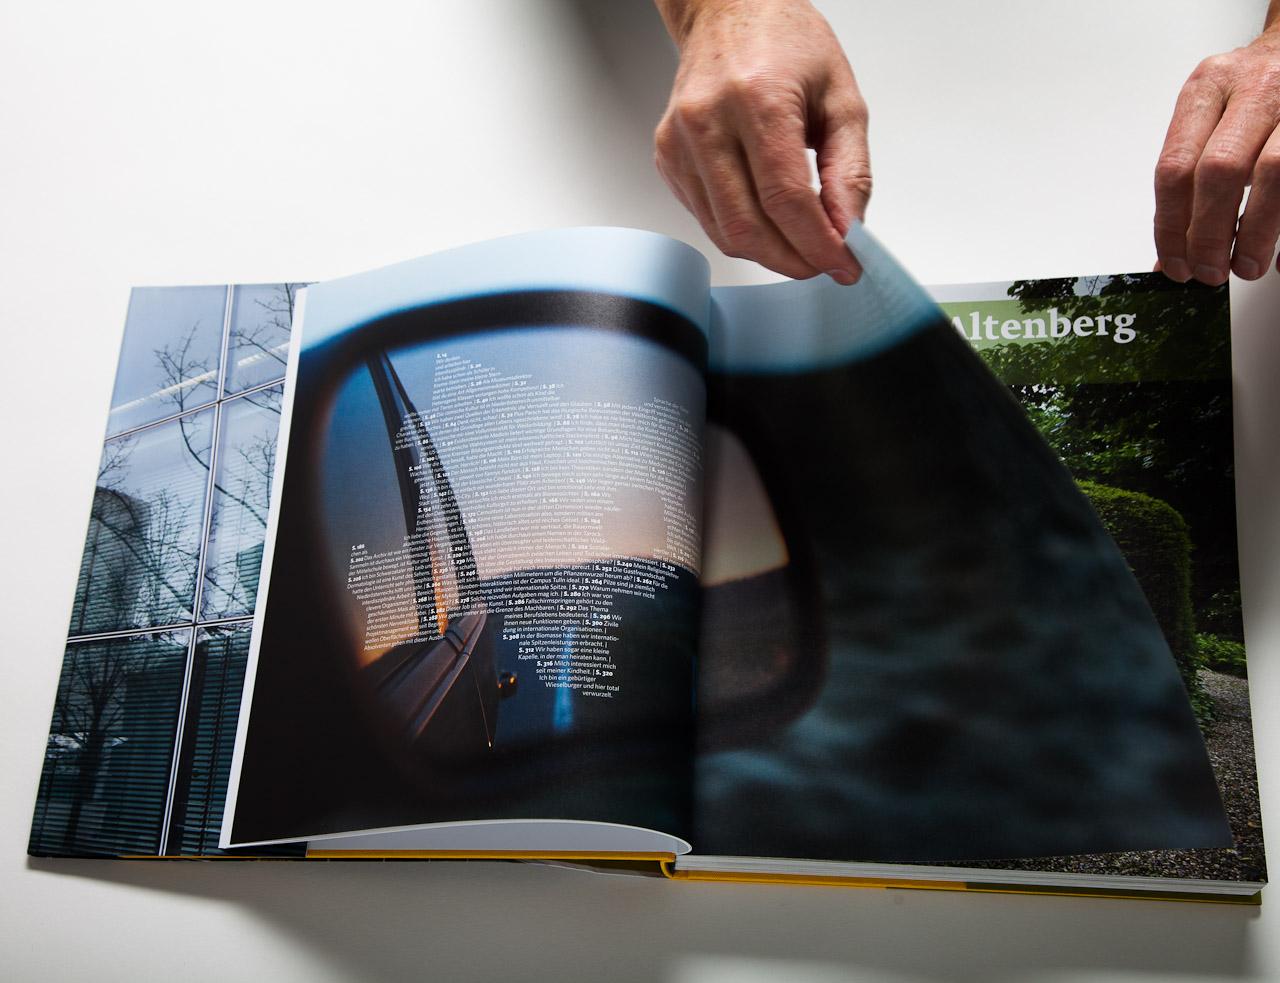 NOE_Buch2_Wissenschaft-8955